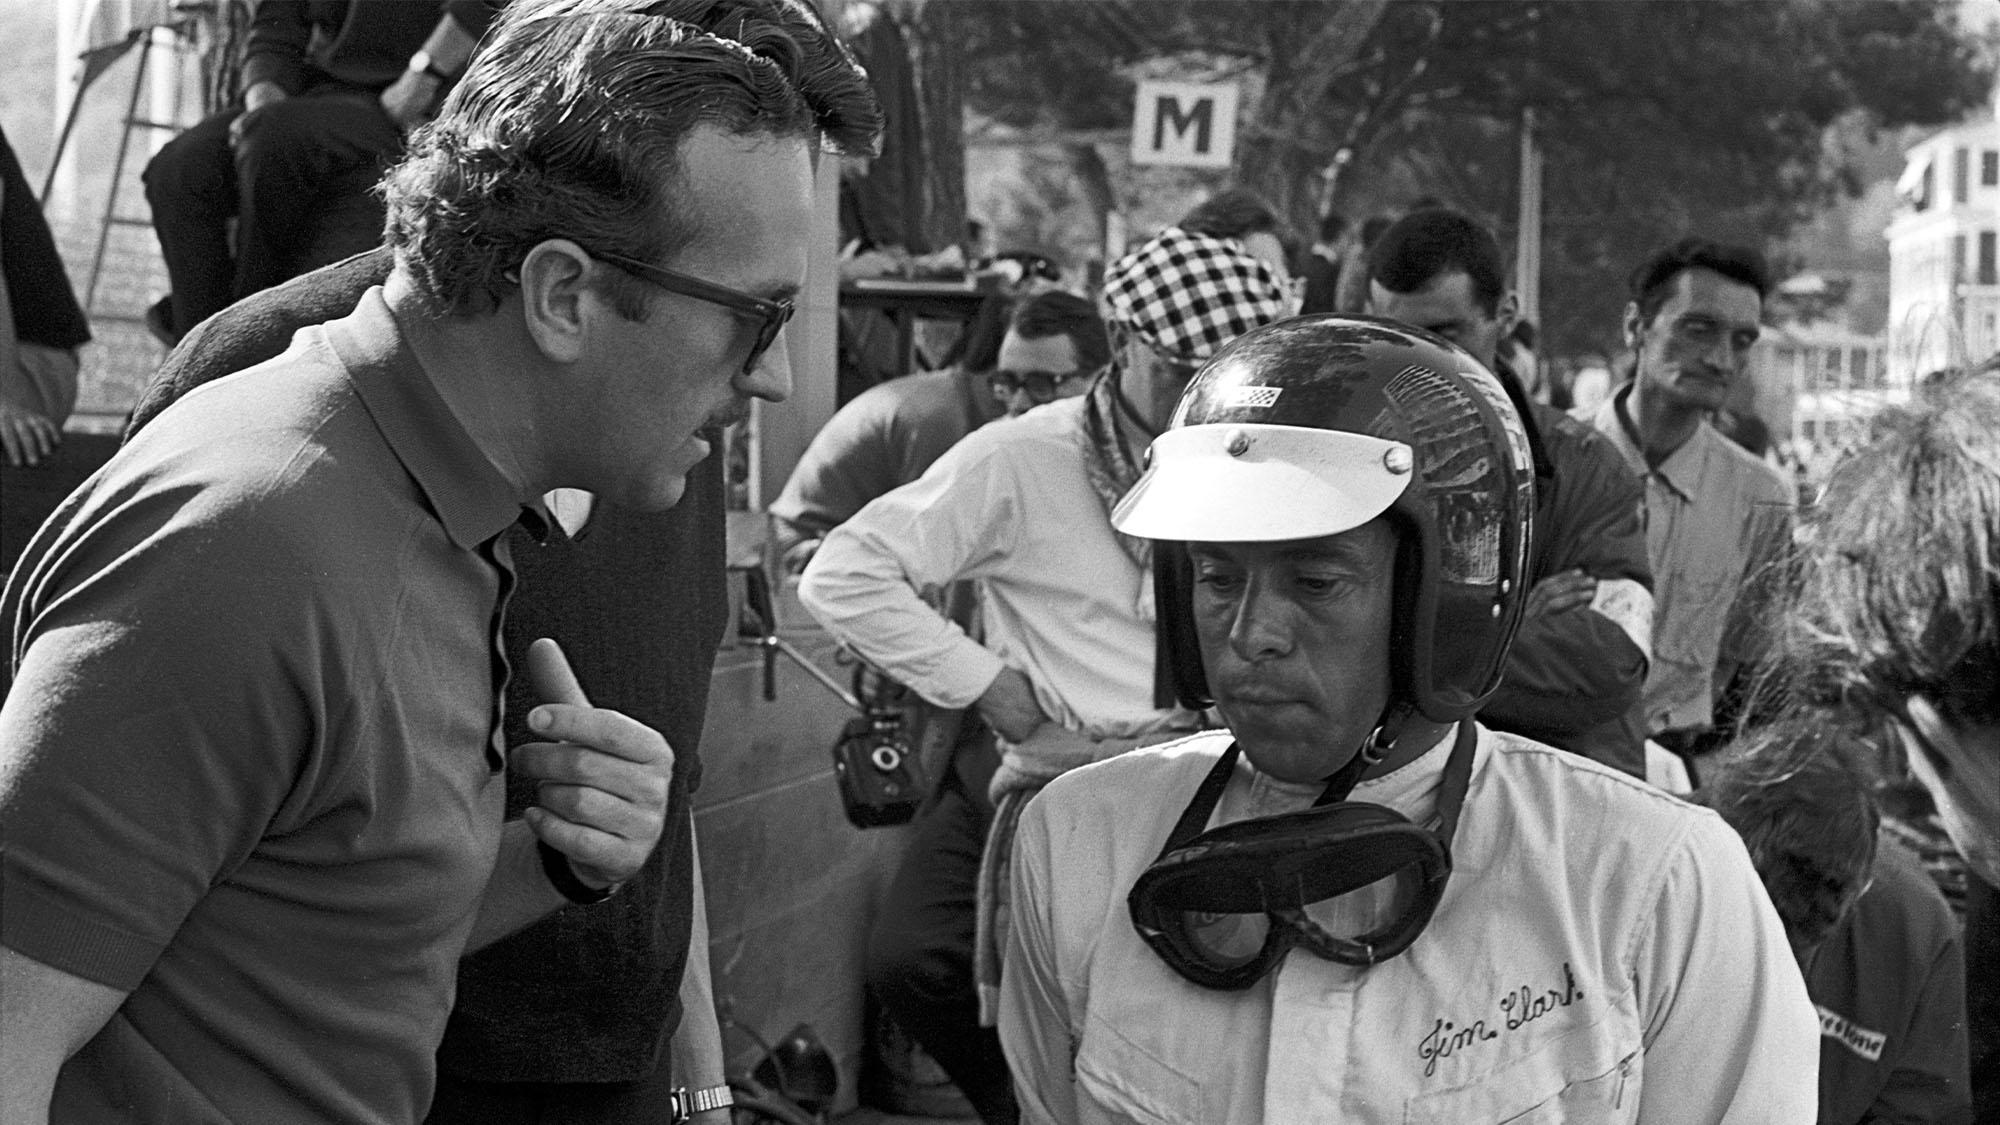 Jim Clark, Colin Chapman, Grand Prix of Monaco, Monaco, 22 May 1966. (Photo by Bernard Cahier/Getty Images)